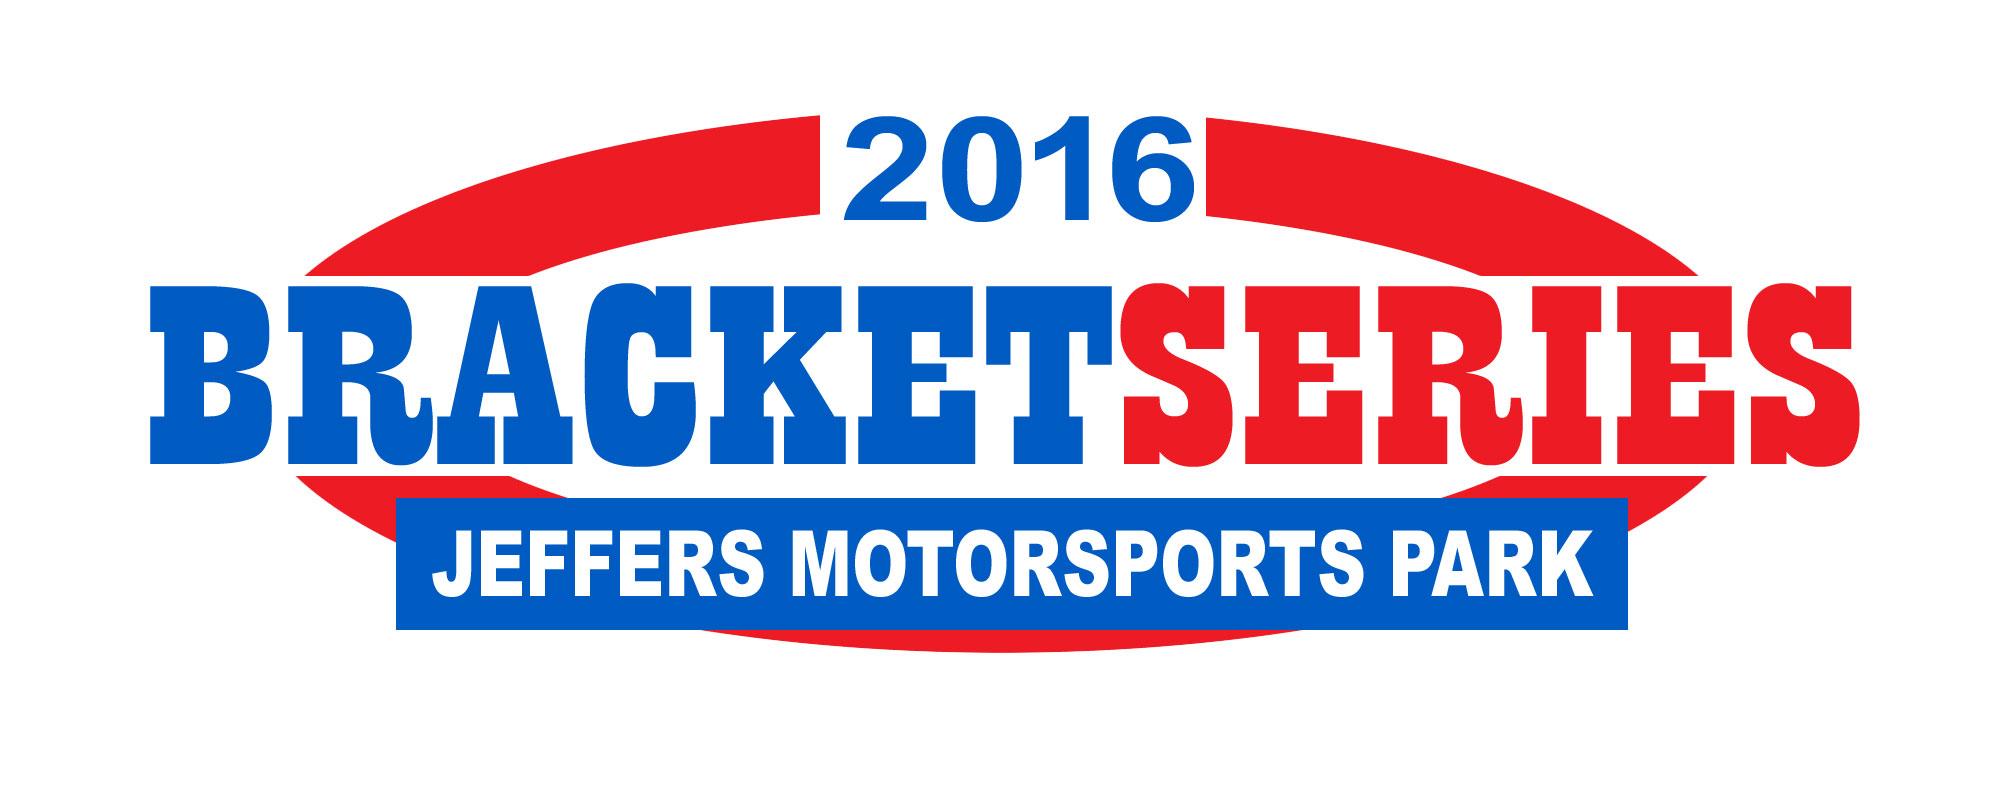 2016-BRACKET-SERIES-JEFFERS